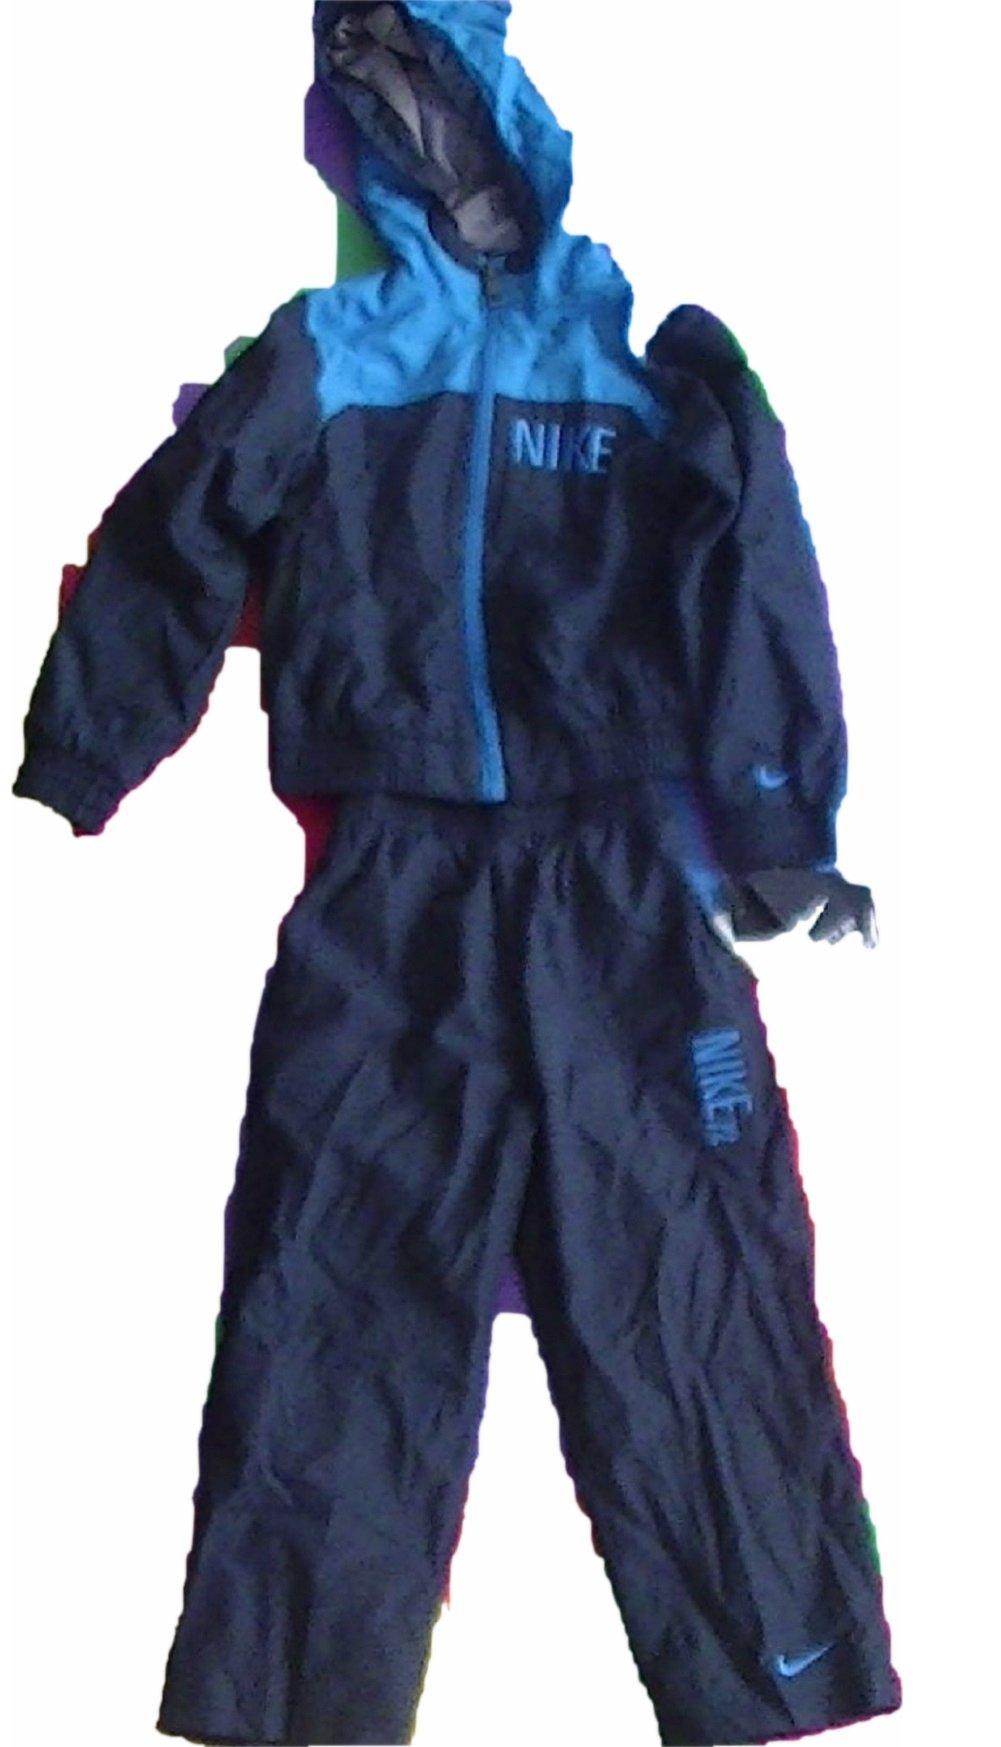 NIKE 2 Piece Toddler Sweatsuit 4 … by NIKE